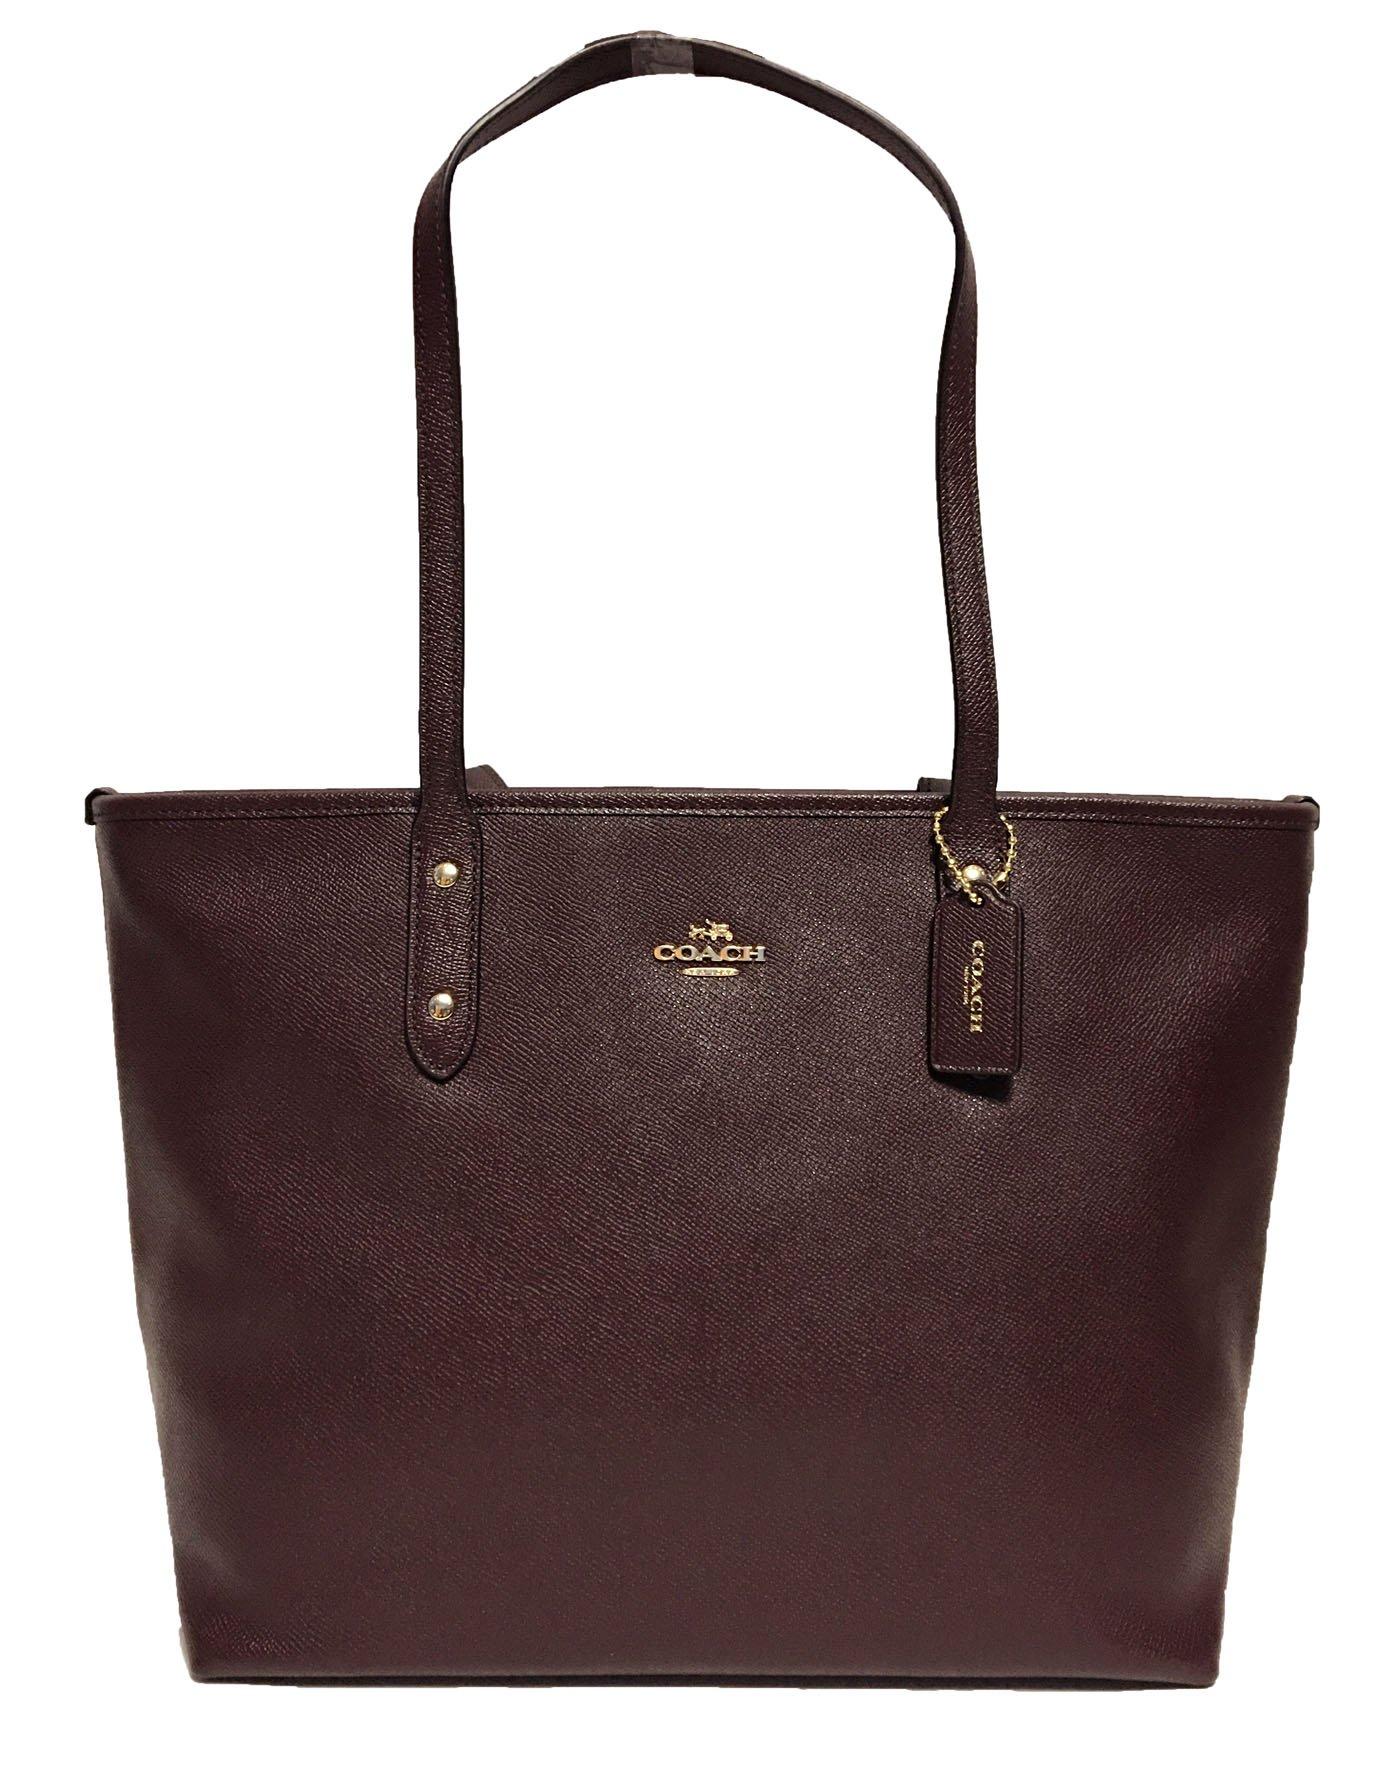 Coach Cross Grain Leather City Zip Tote Bag Purse (Oxblood)